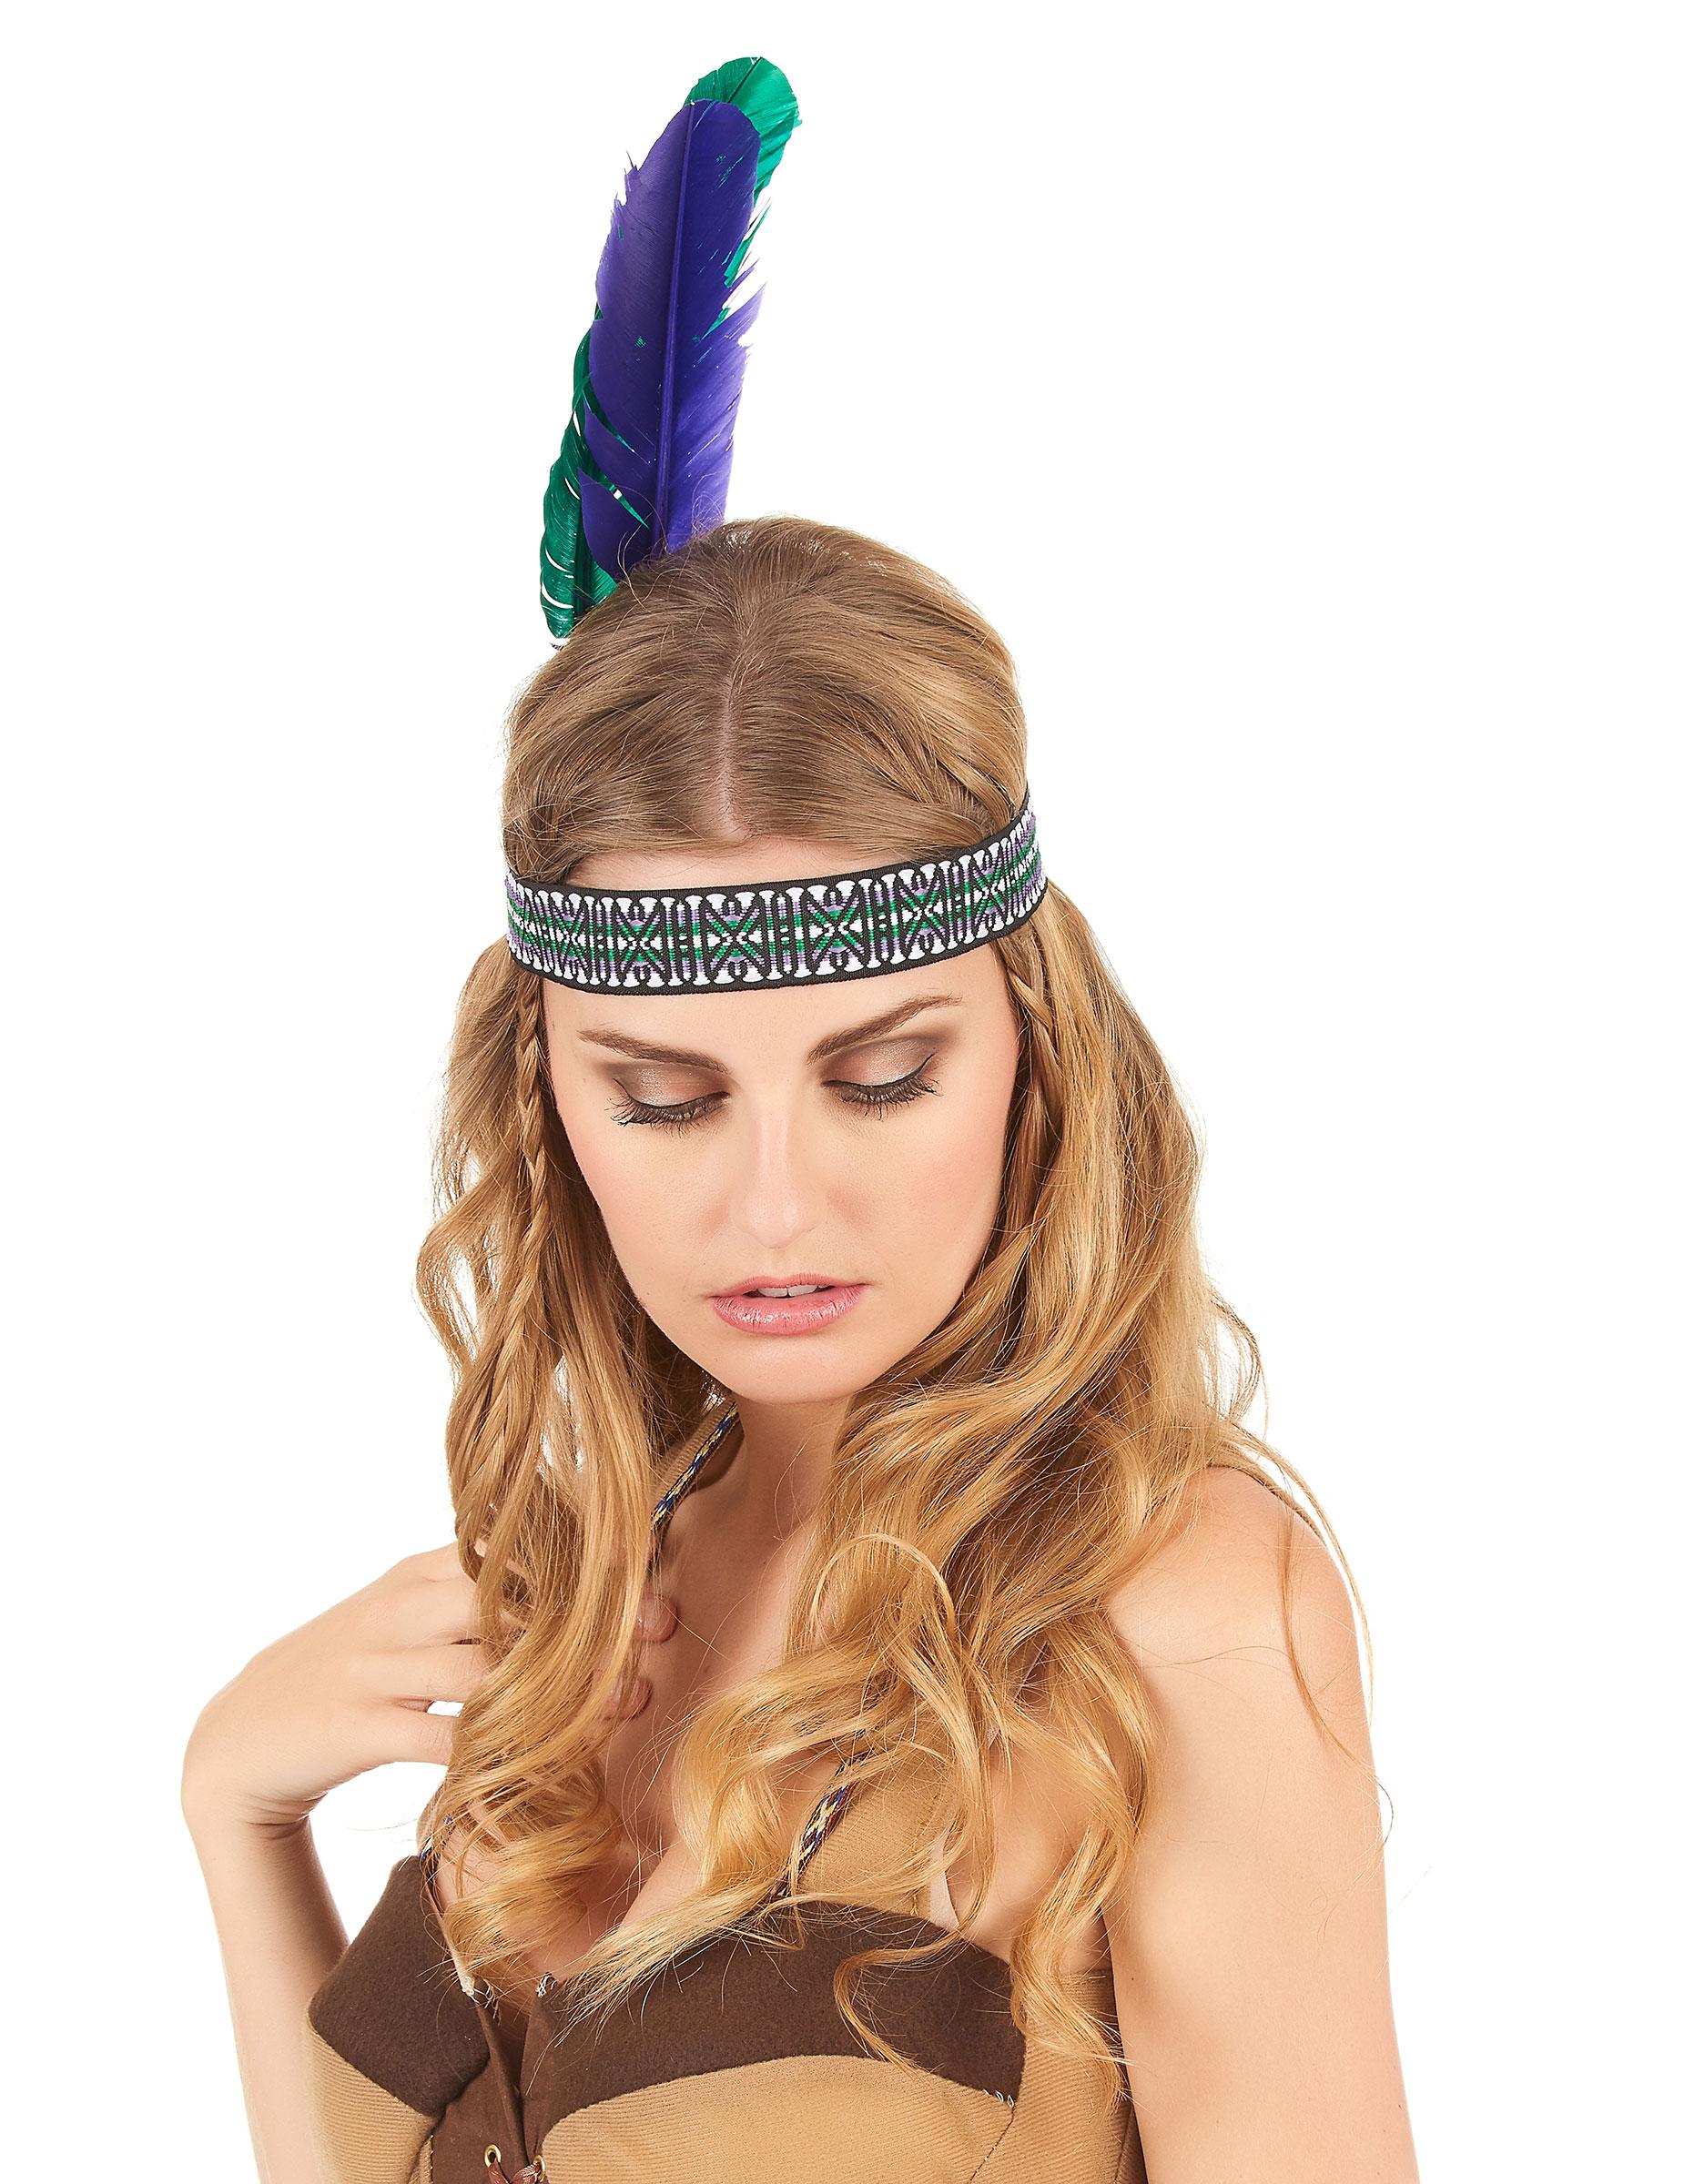 indianer kopfschmuck haarband federn gr n lila g nstige faschings accessoires zubeh r bei. Black Bedroom Furniture Sets. Home Design Ideas